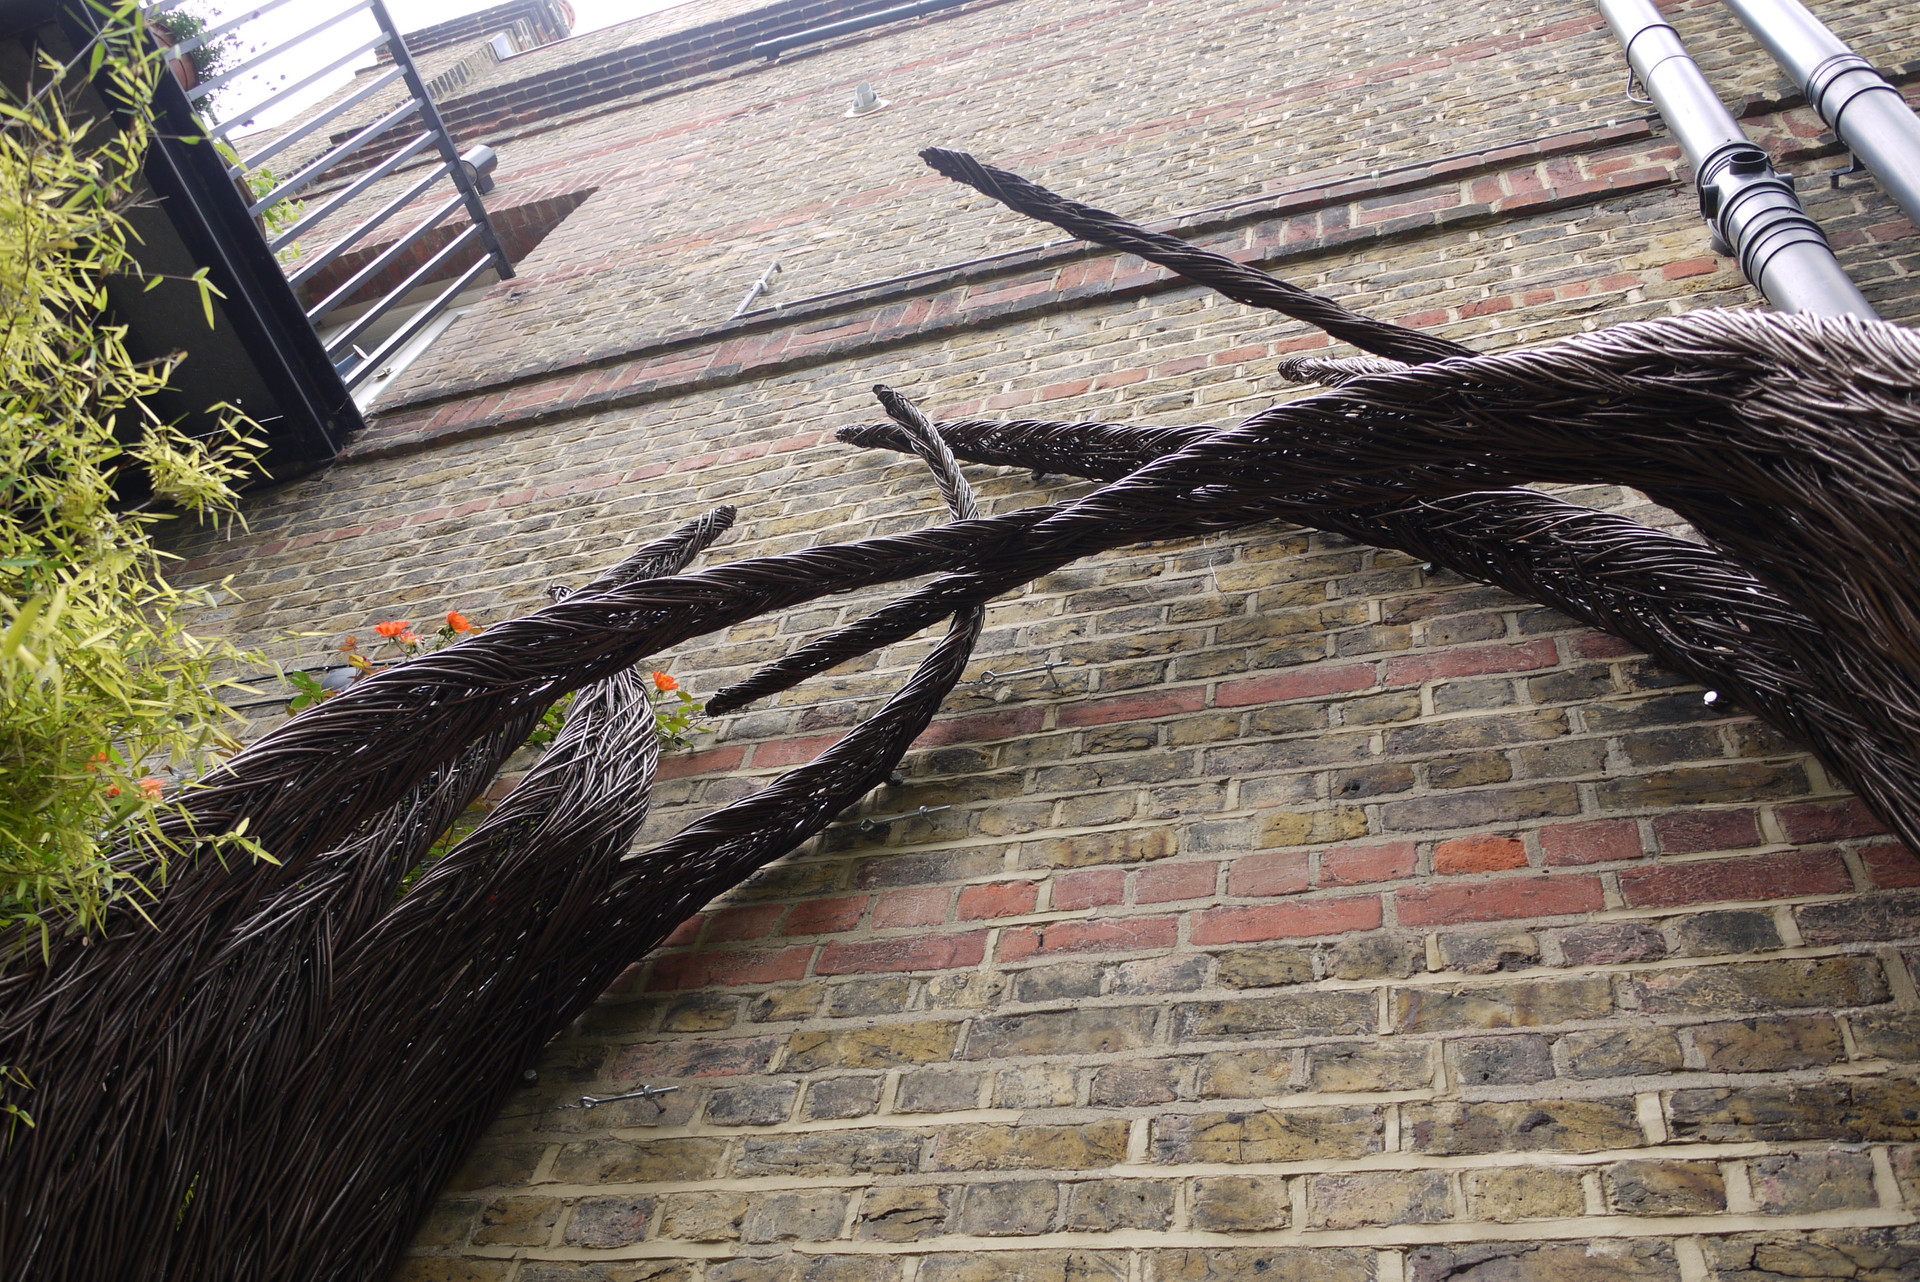 roofgarden.structure_leafL1_spencerjenki